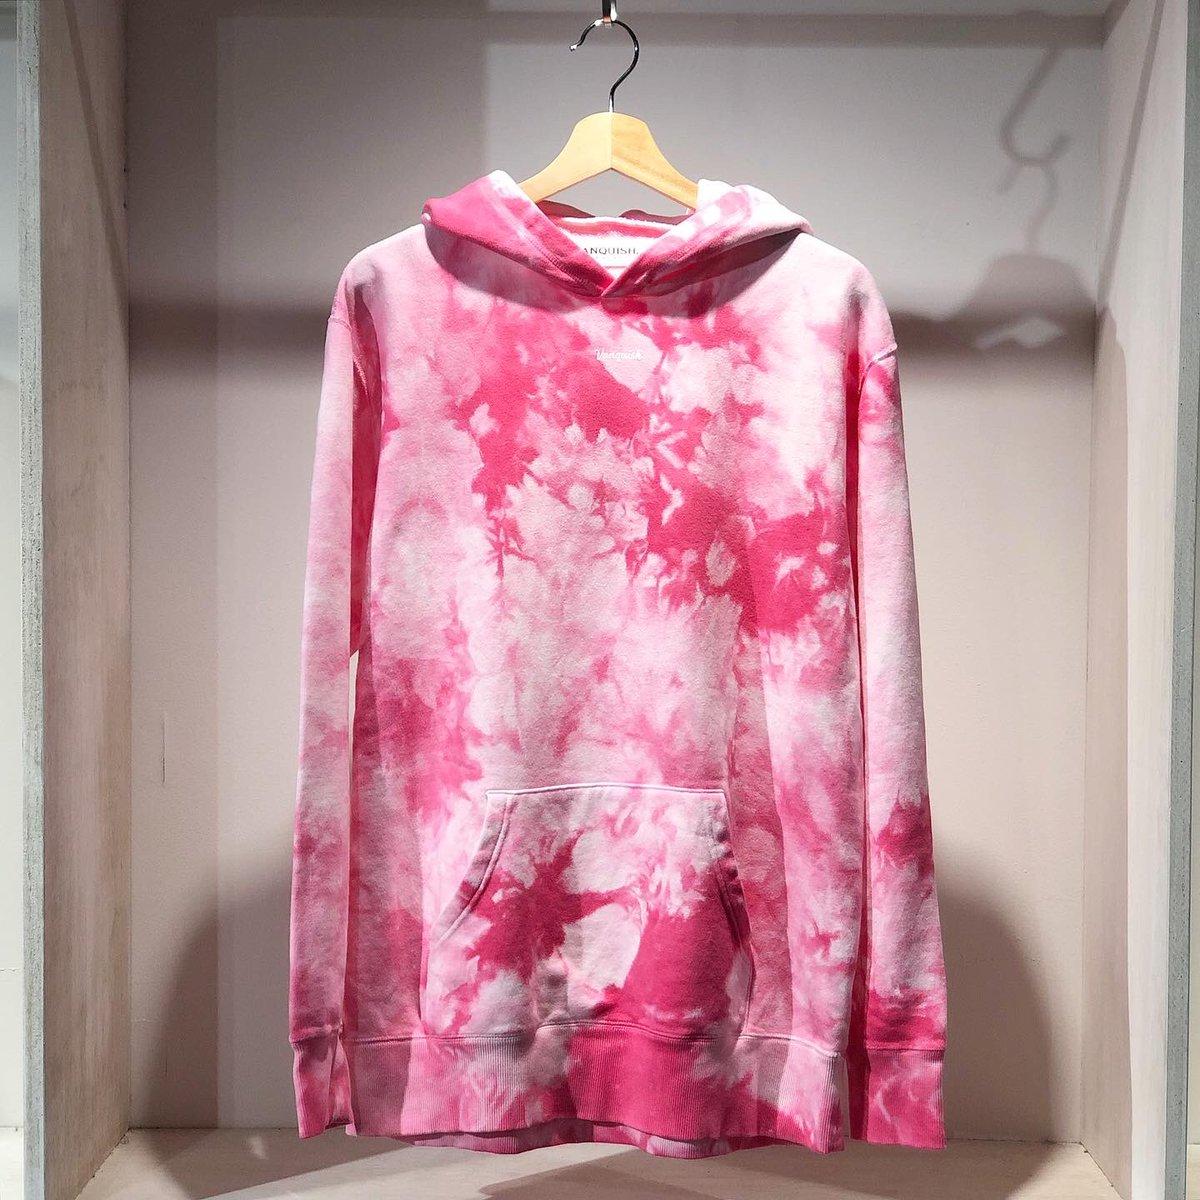 New arrival. [ Small logo Tie dye pattern Hoodie ] @vanquishjp . size : (M), (L),. . #revanto #vanquish #vanquishjapan #japanmade #selectshop #hoodie #tiedye #streetfashion #unisexfashion #金沢 #片町pic.twitter.com/QZt5D6Zs0F